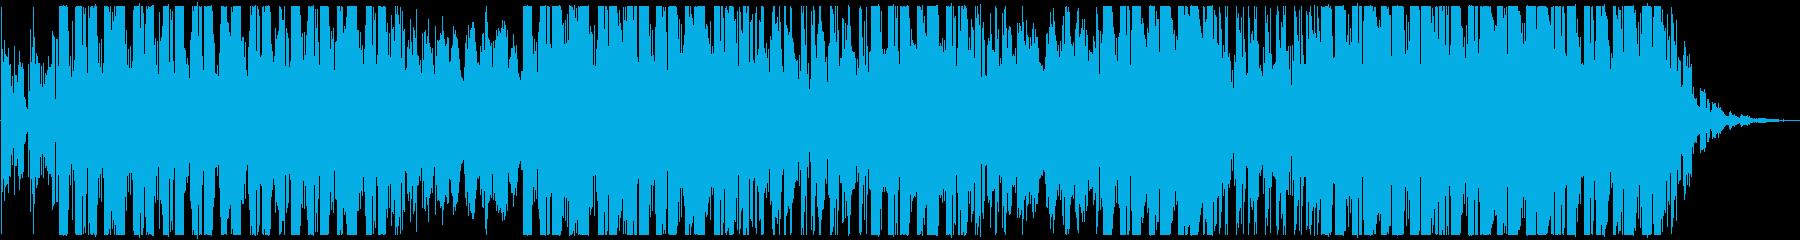 Lo-Fi HipHop最先端のお洒落の再生済みの波形